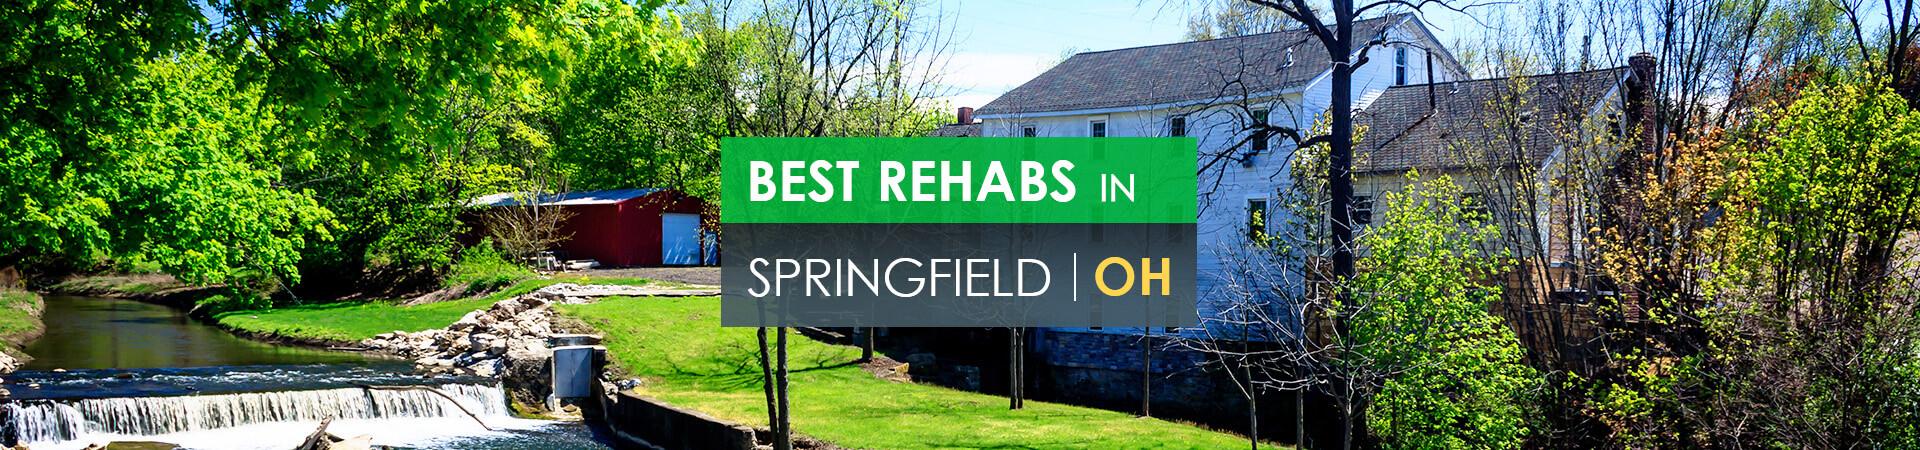 Best rehabs in Springfield, OH